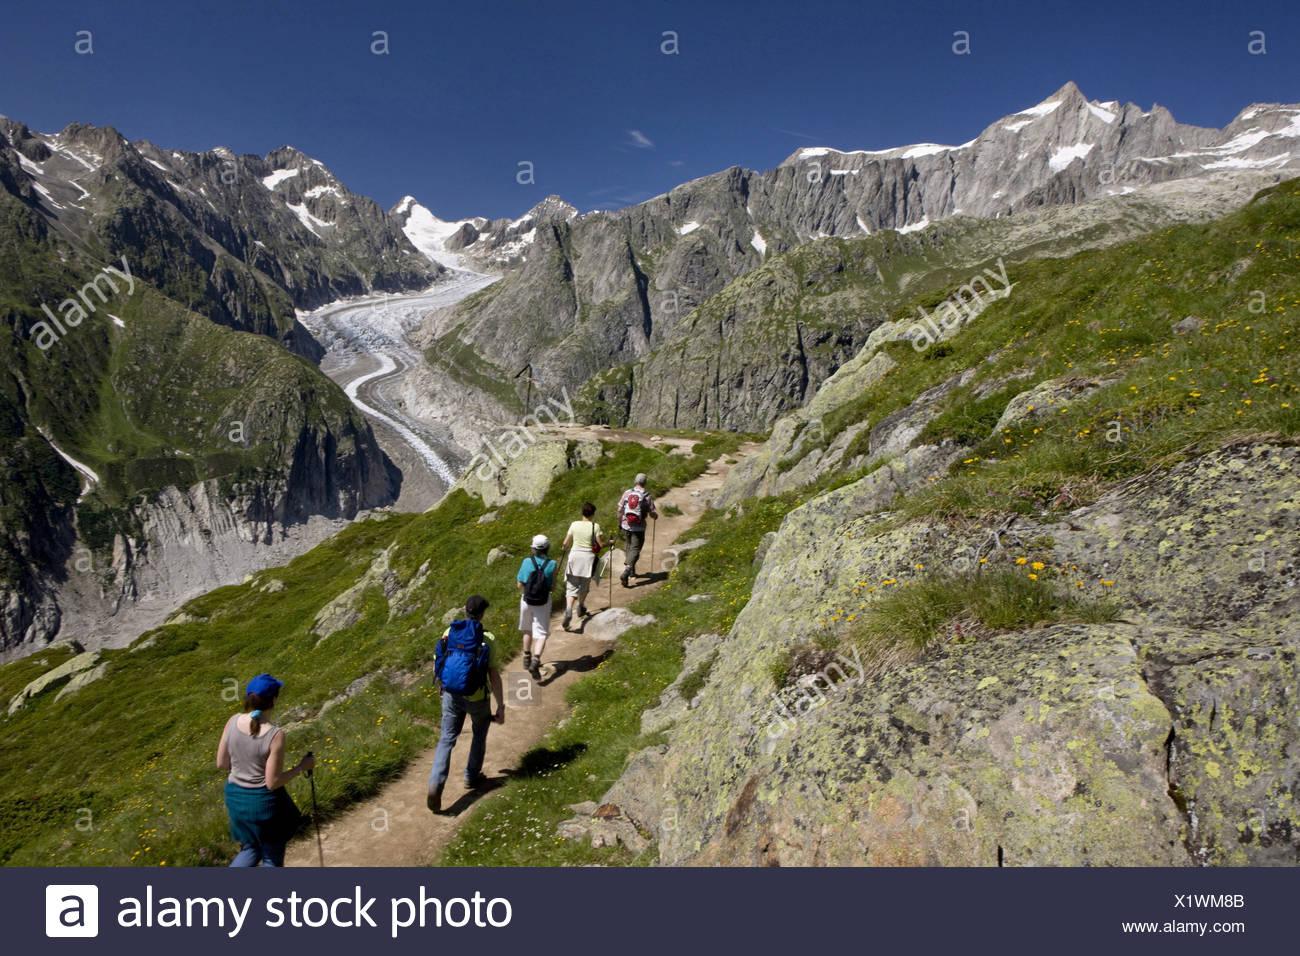 Switzerland swiss walk hike group five persons footpath scenery nature Fieschergletscher Alpine roses mountains canton Valais - Stock Image